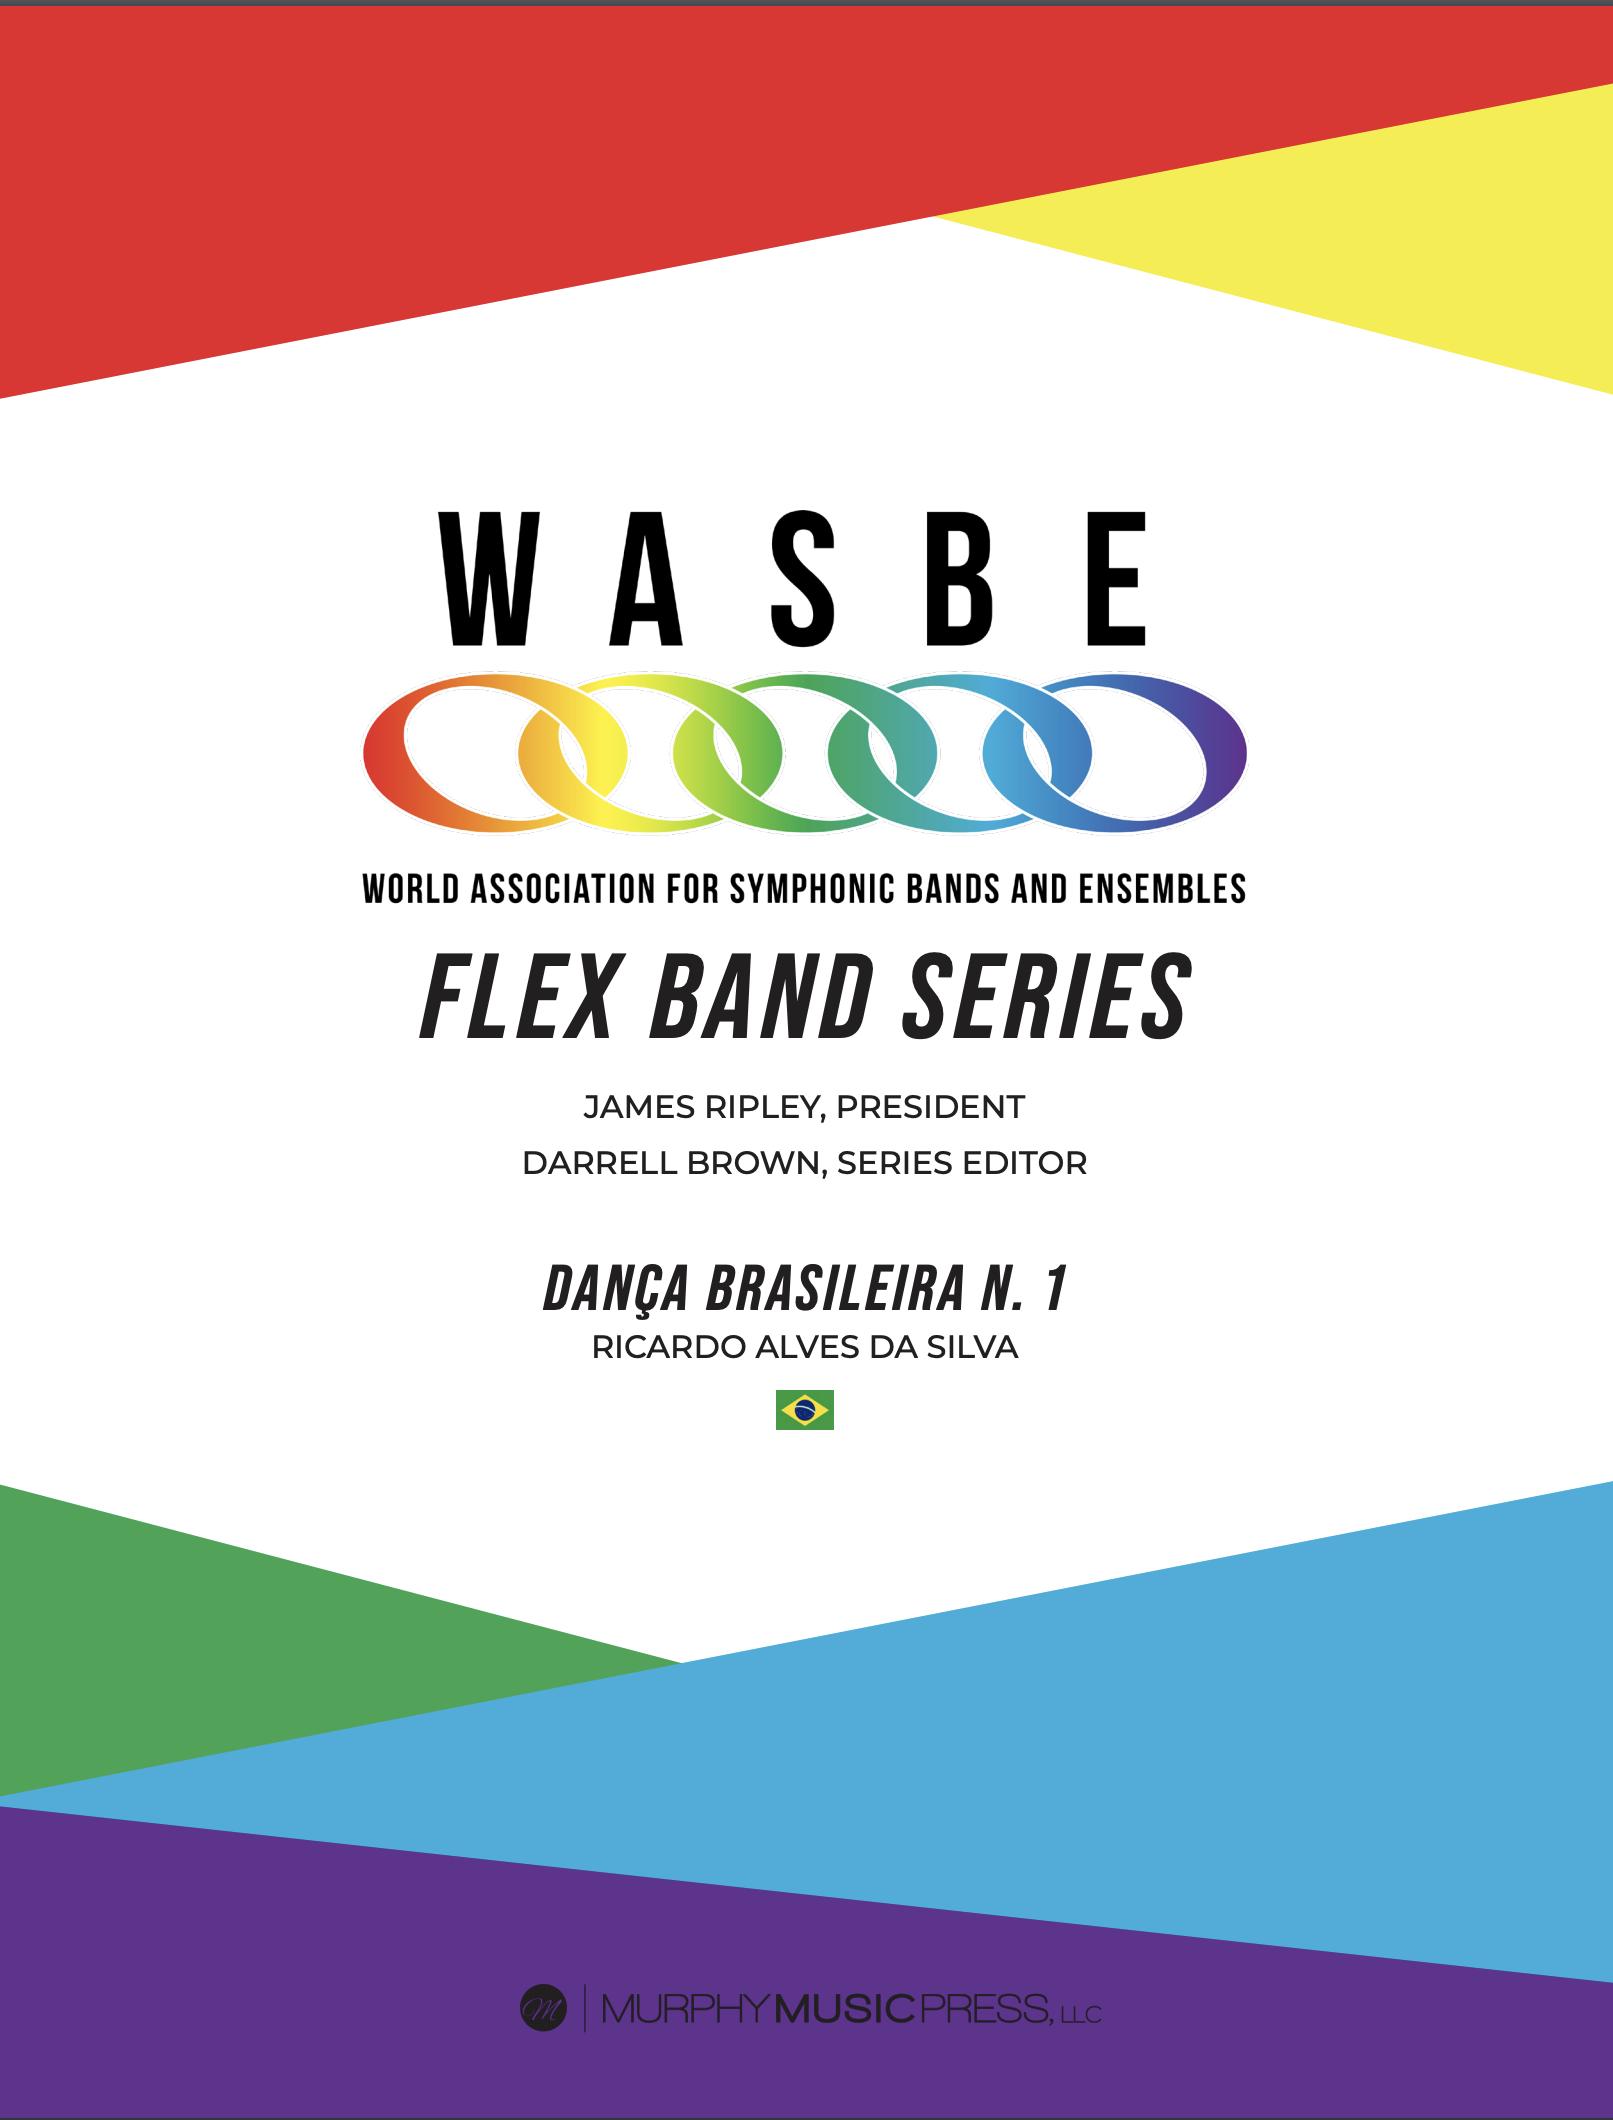 Dance Brasileria N.1 by Ricardo Silva